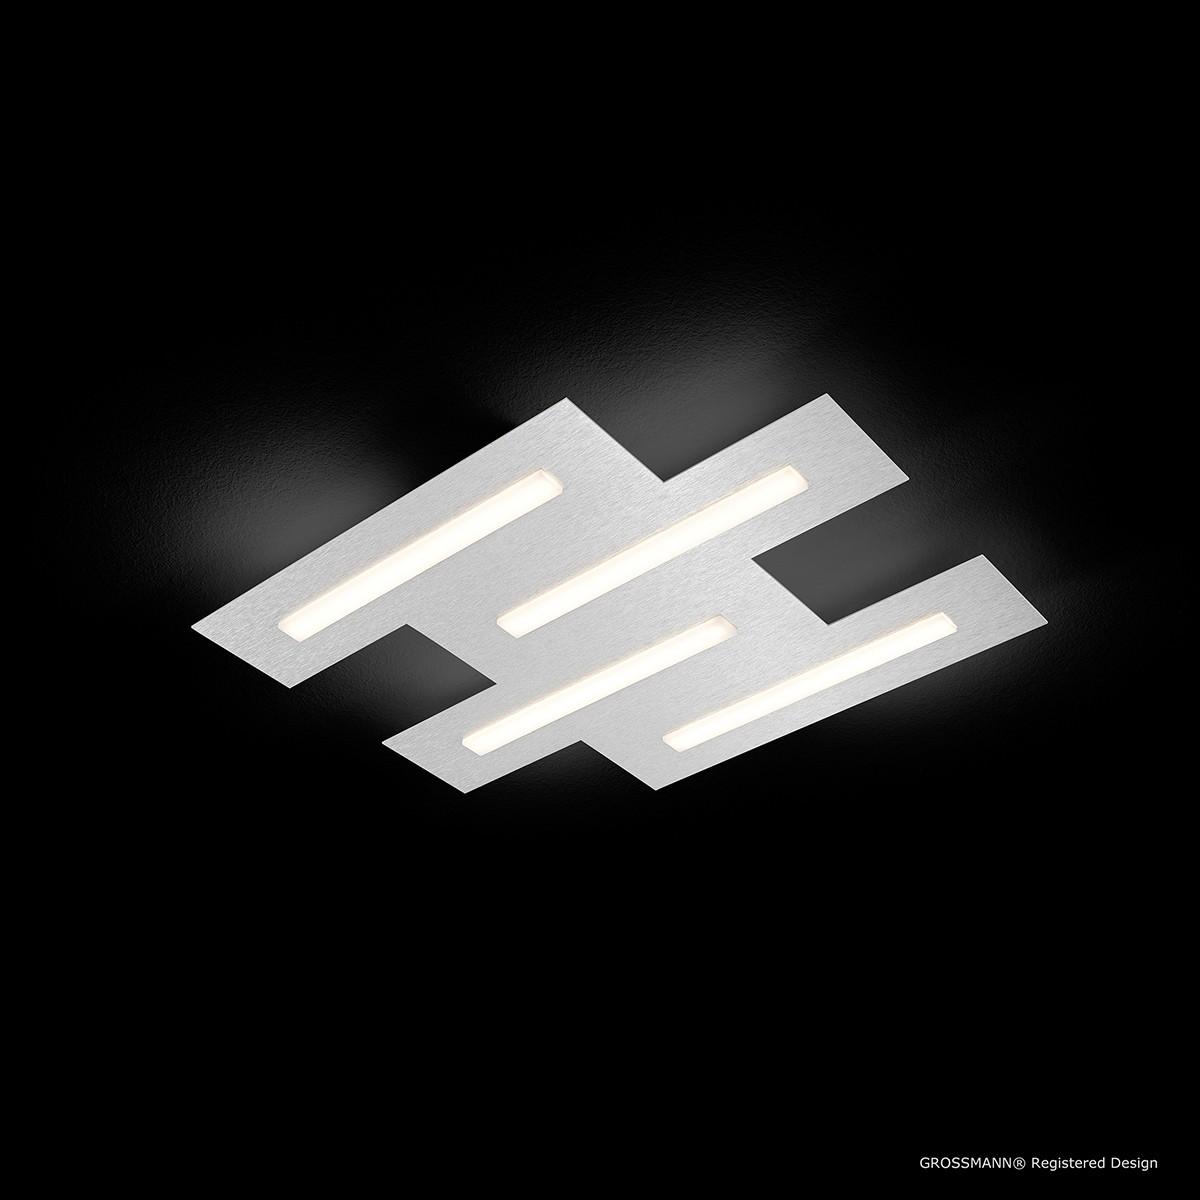 Grossmann Fis LED Deckenleuchte, 4-flg., Aluminium gebürstet